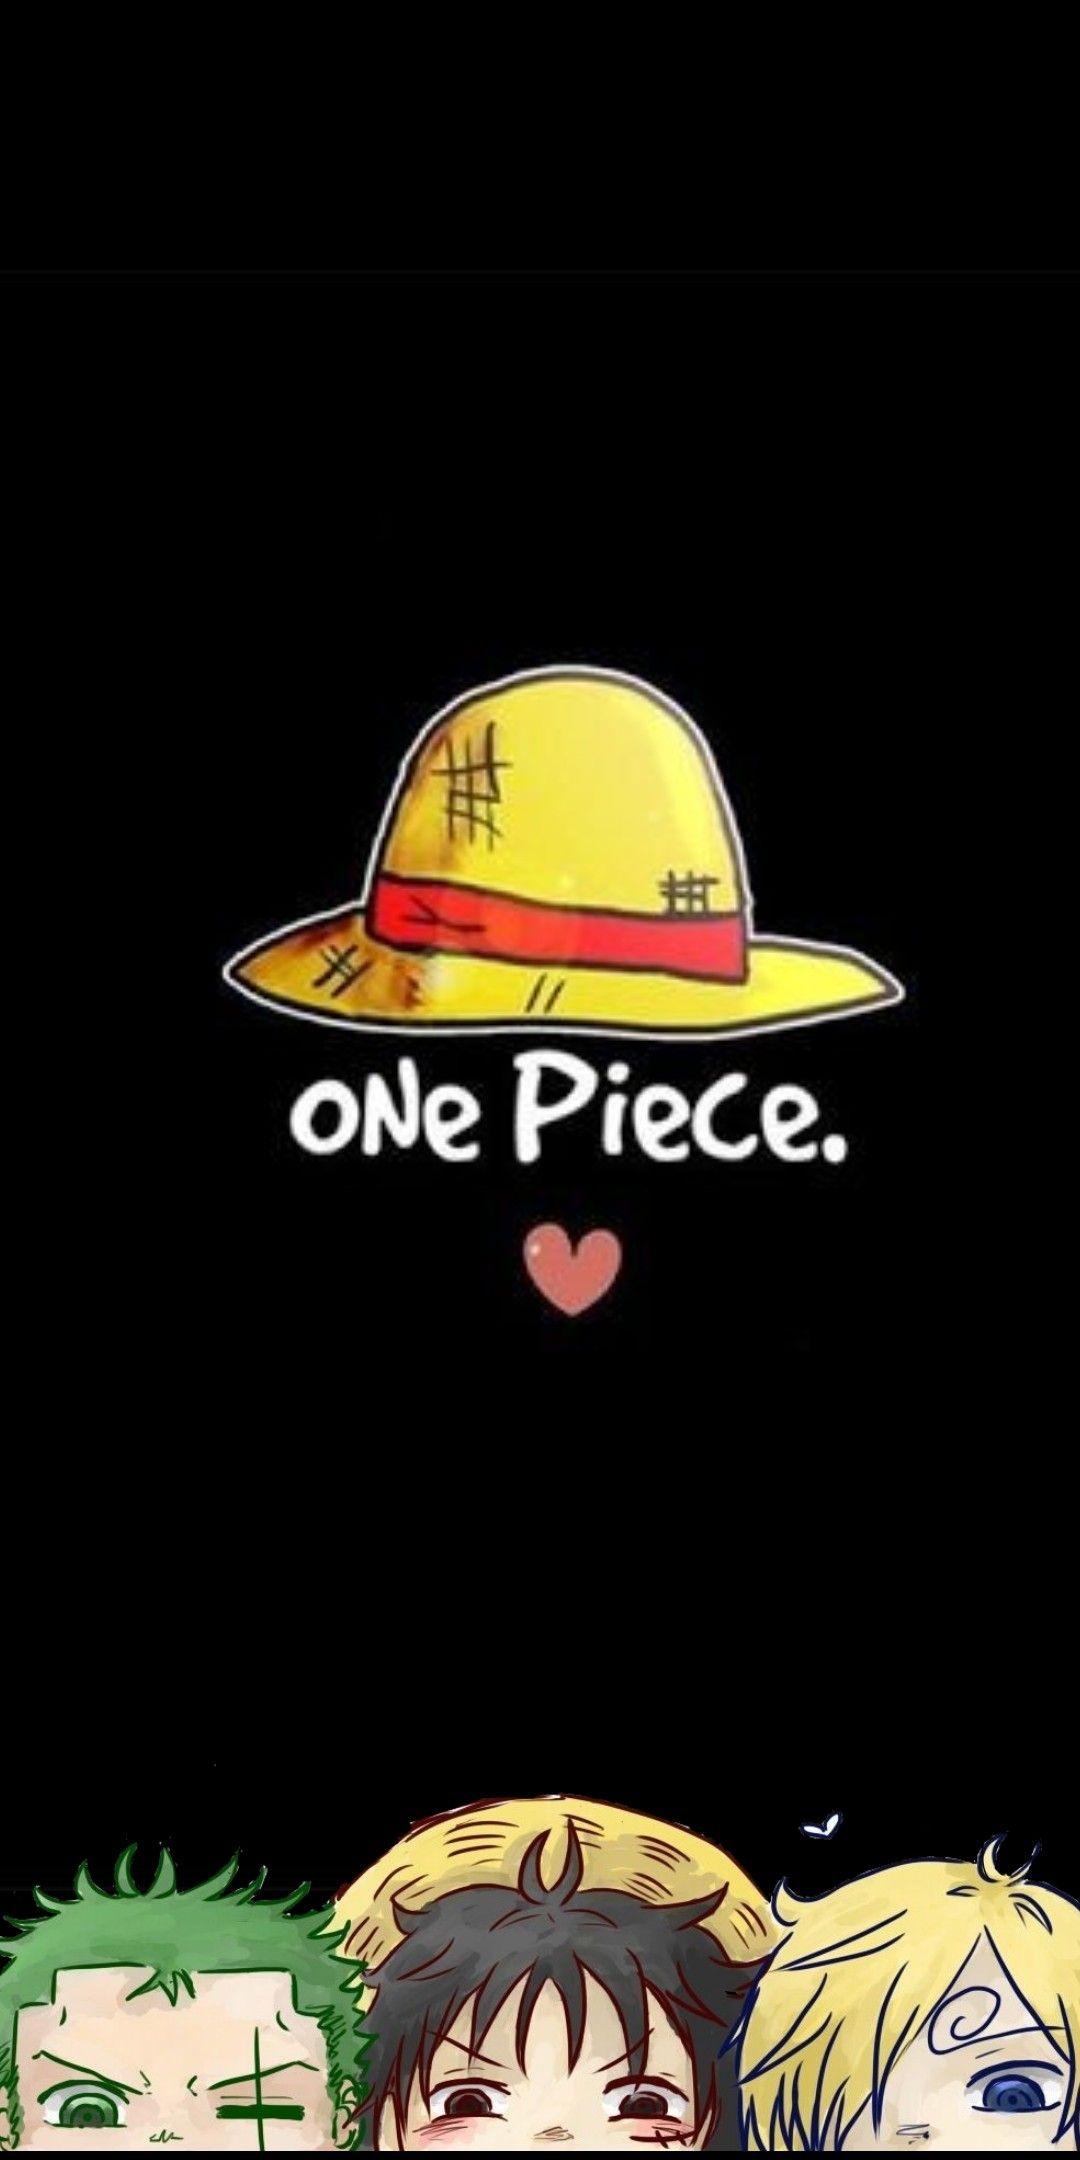 One Piece One Piece Wallpaper Iphone Manga Anime One Piece One Piece Anime